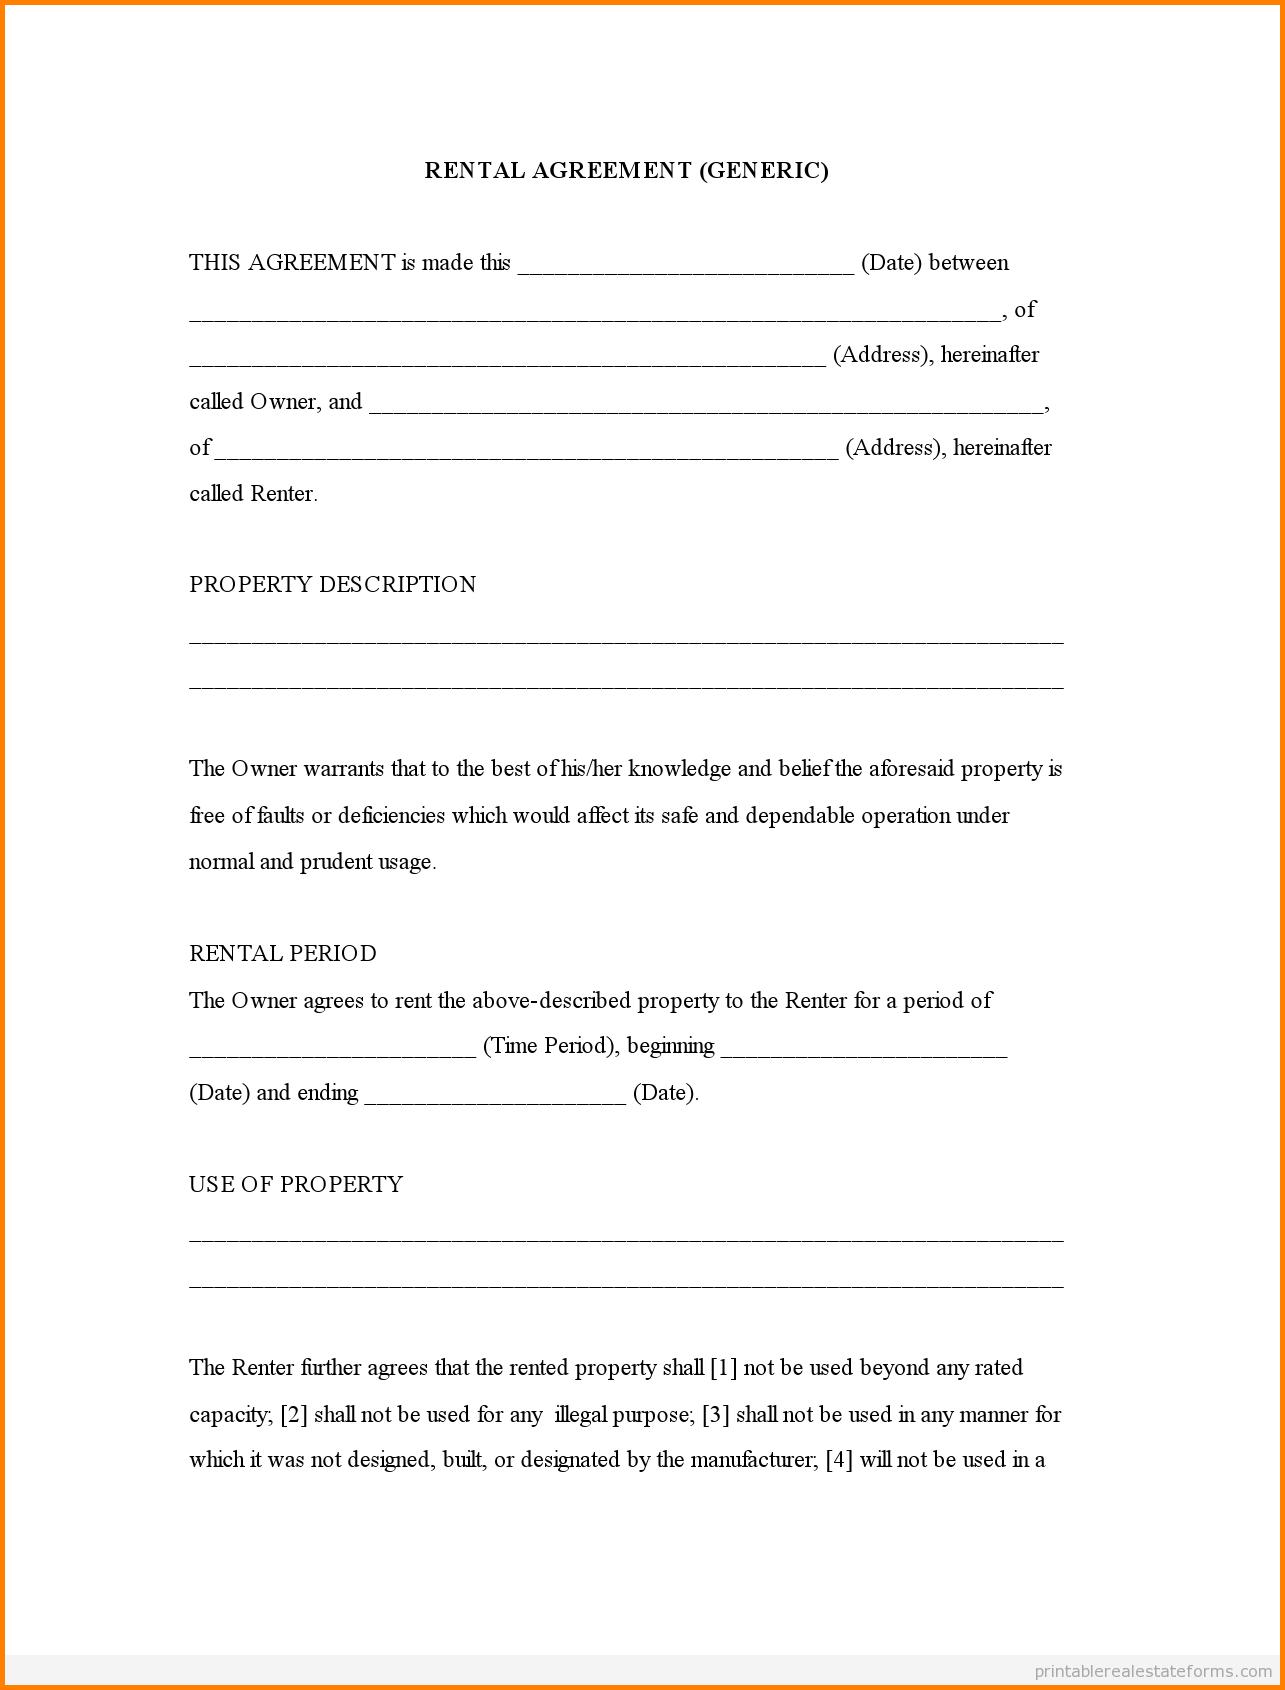 006 Template Ideas Printable Rental Agreement Free Lease Form 142669 - Free Printable Rental Agreement